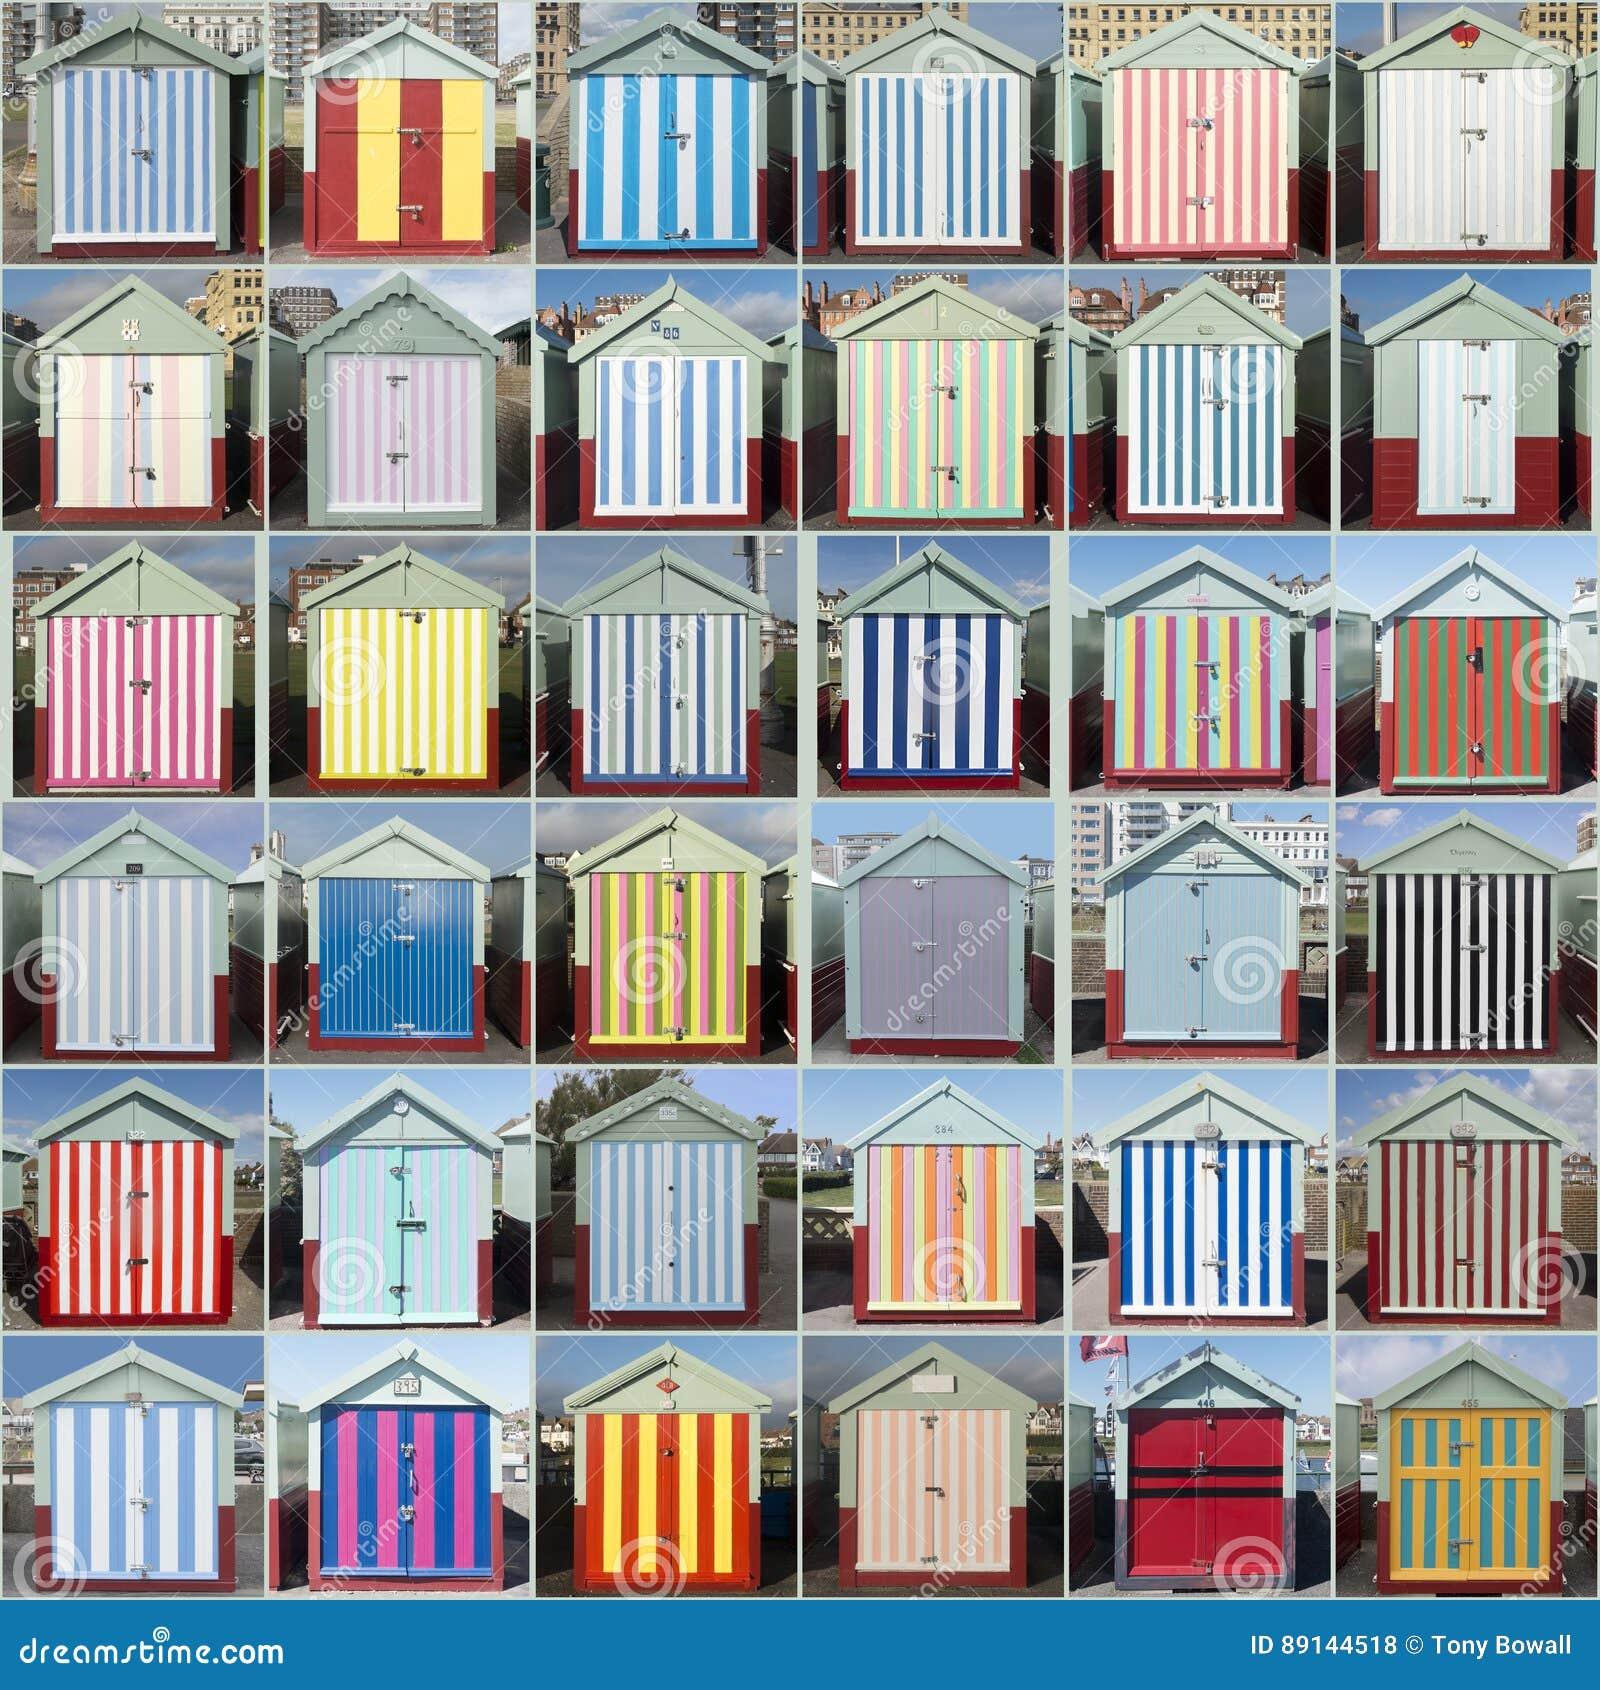 36 Striped Beach Huts, Hove, Sussex, UK